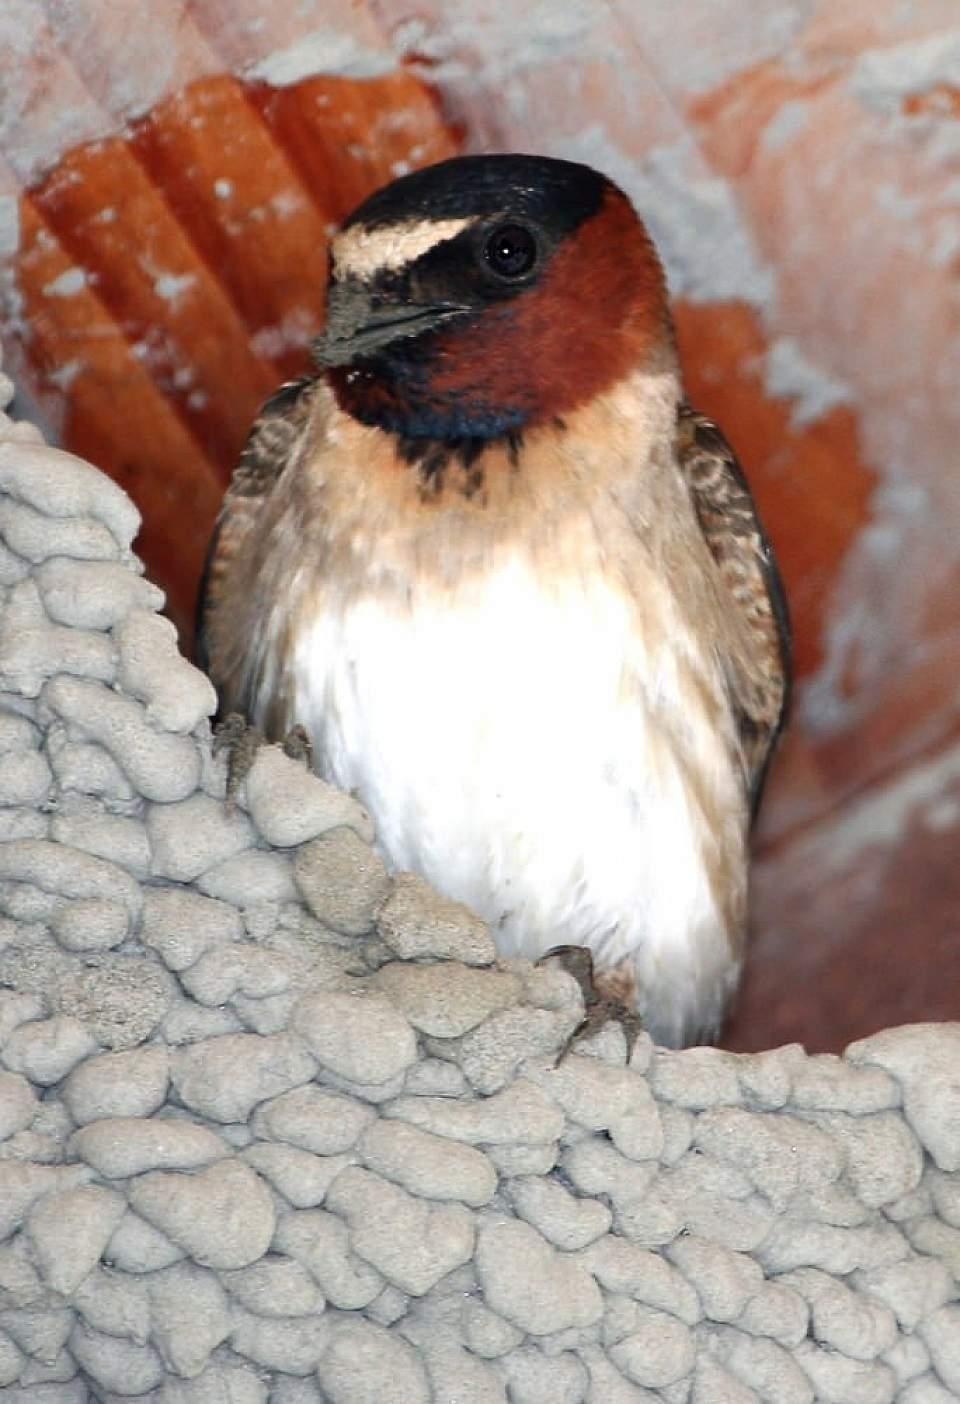 Alaska species birds FWS Donna Dewhurst cliffswallow